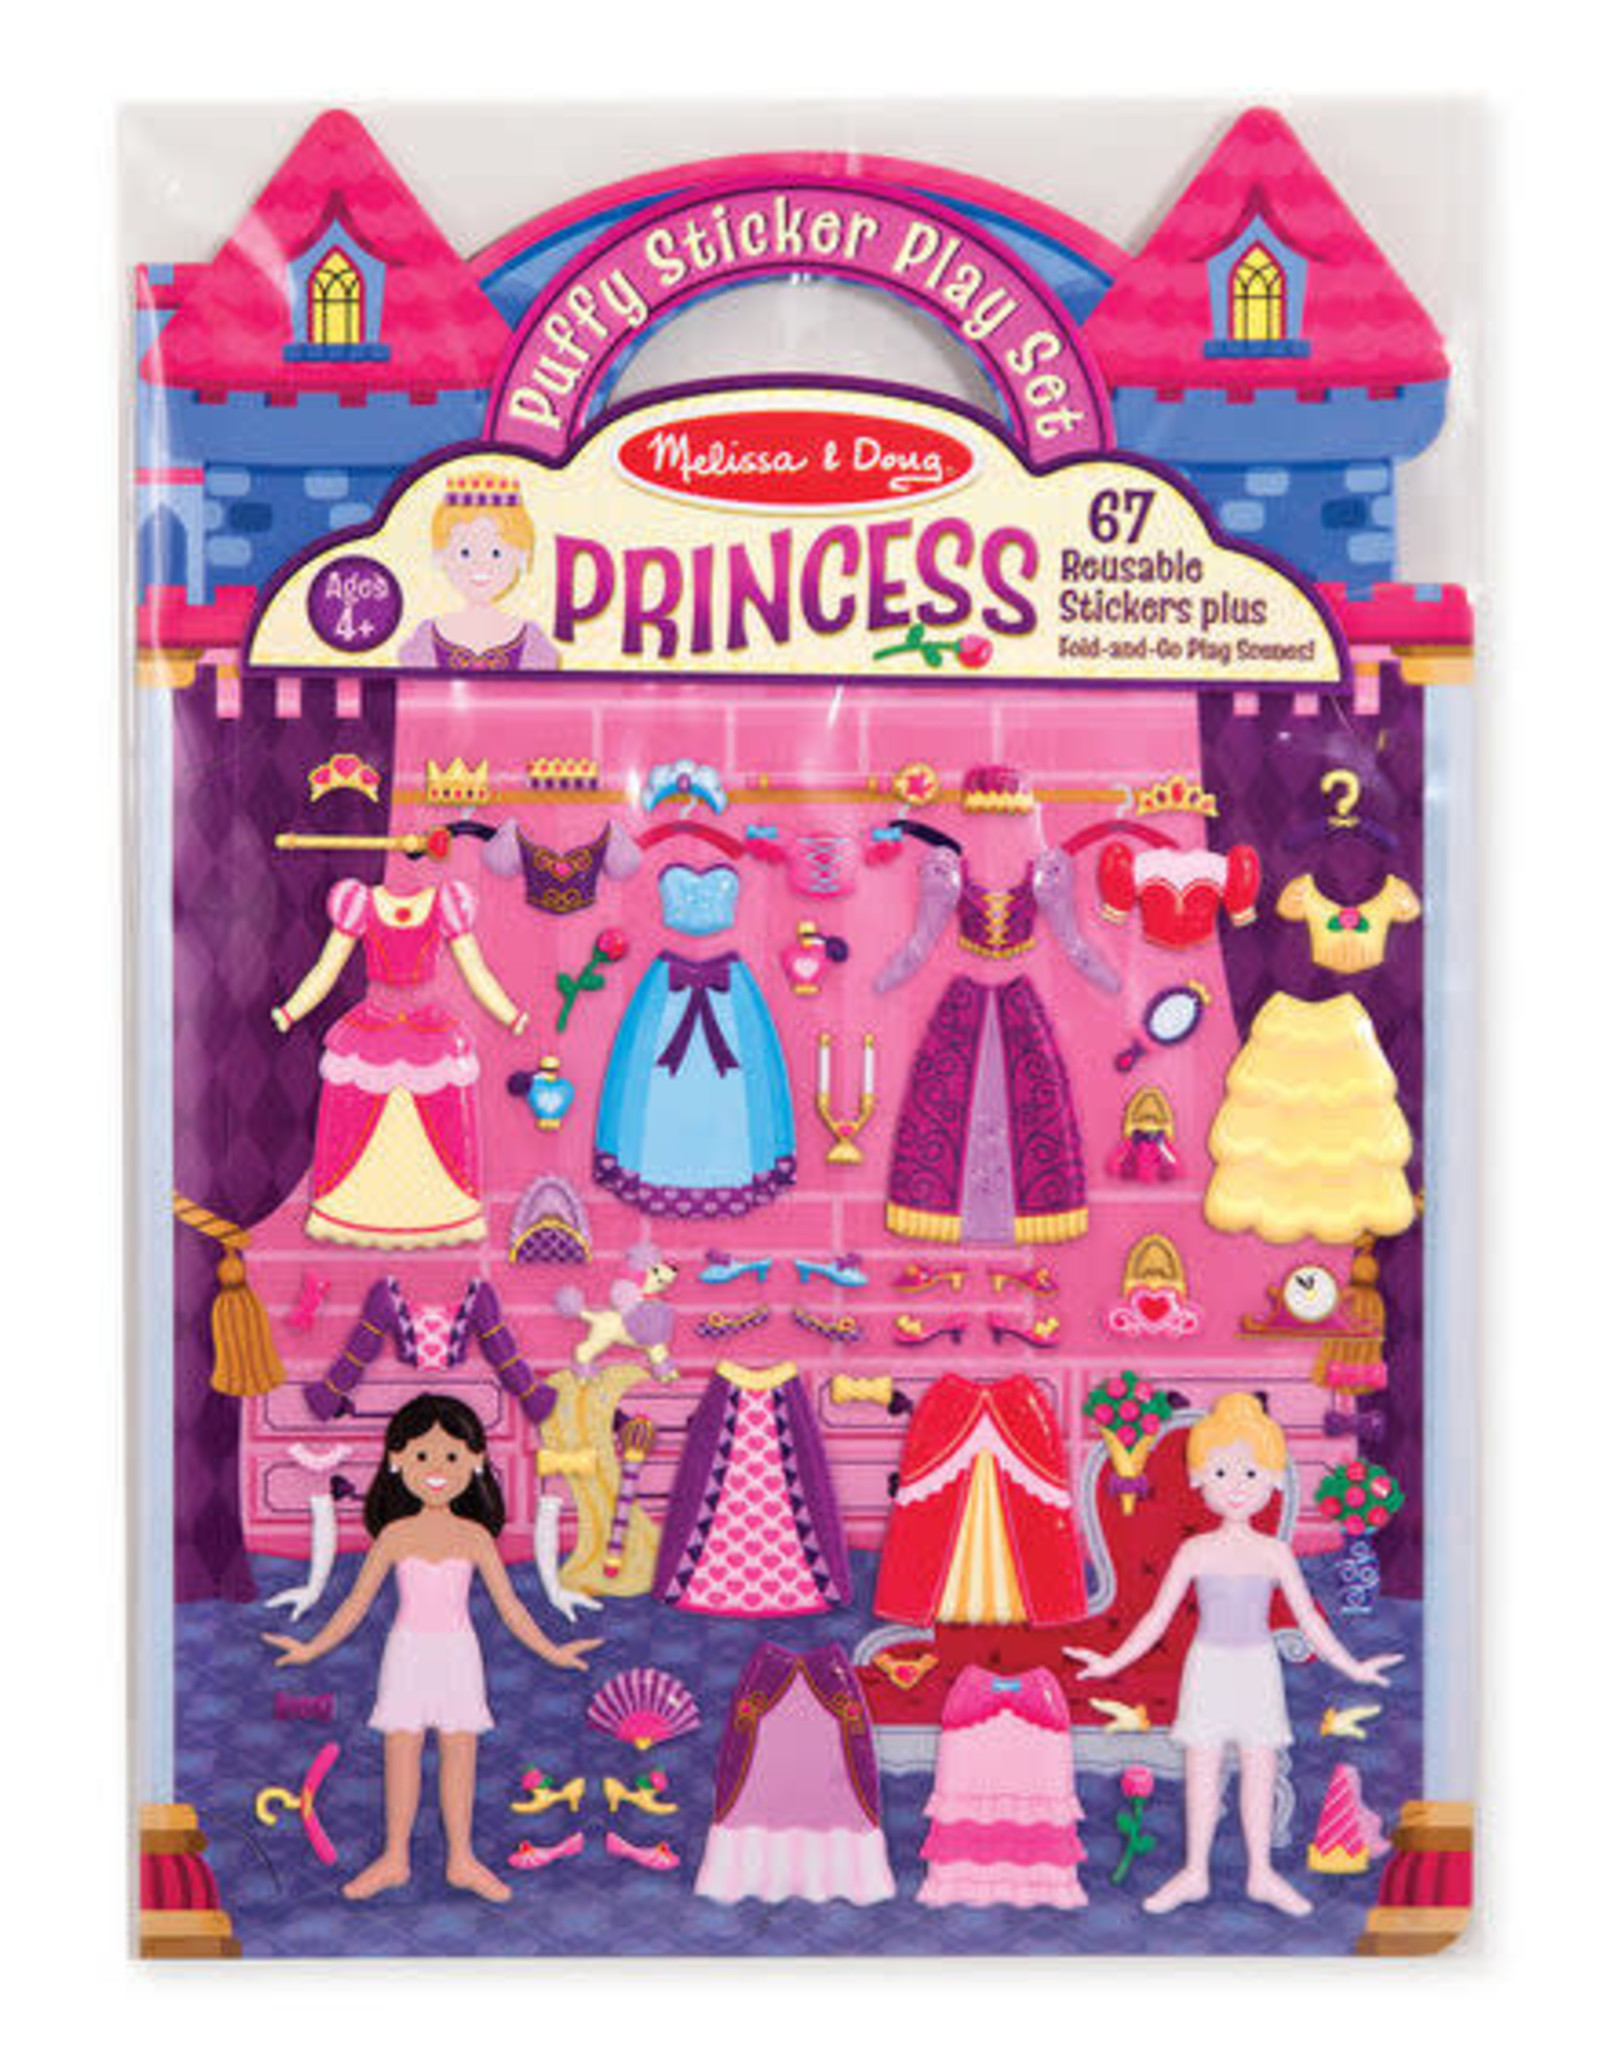 Melissa & Doug MD Puffy Stickers Princess